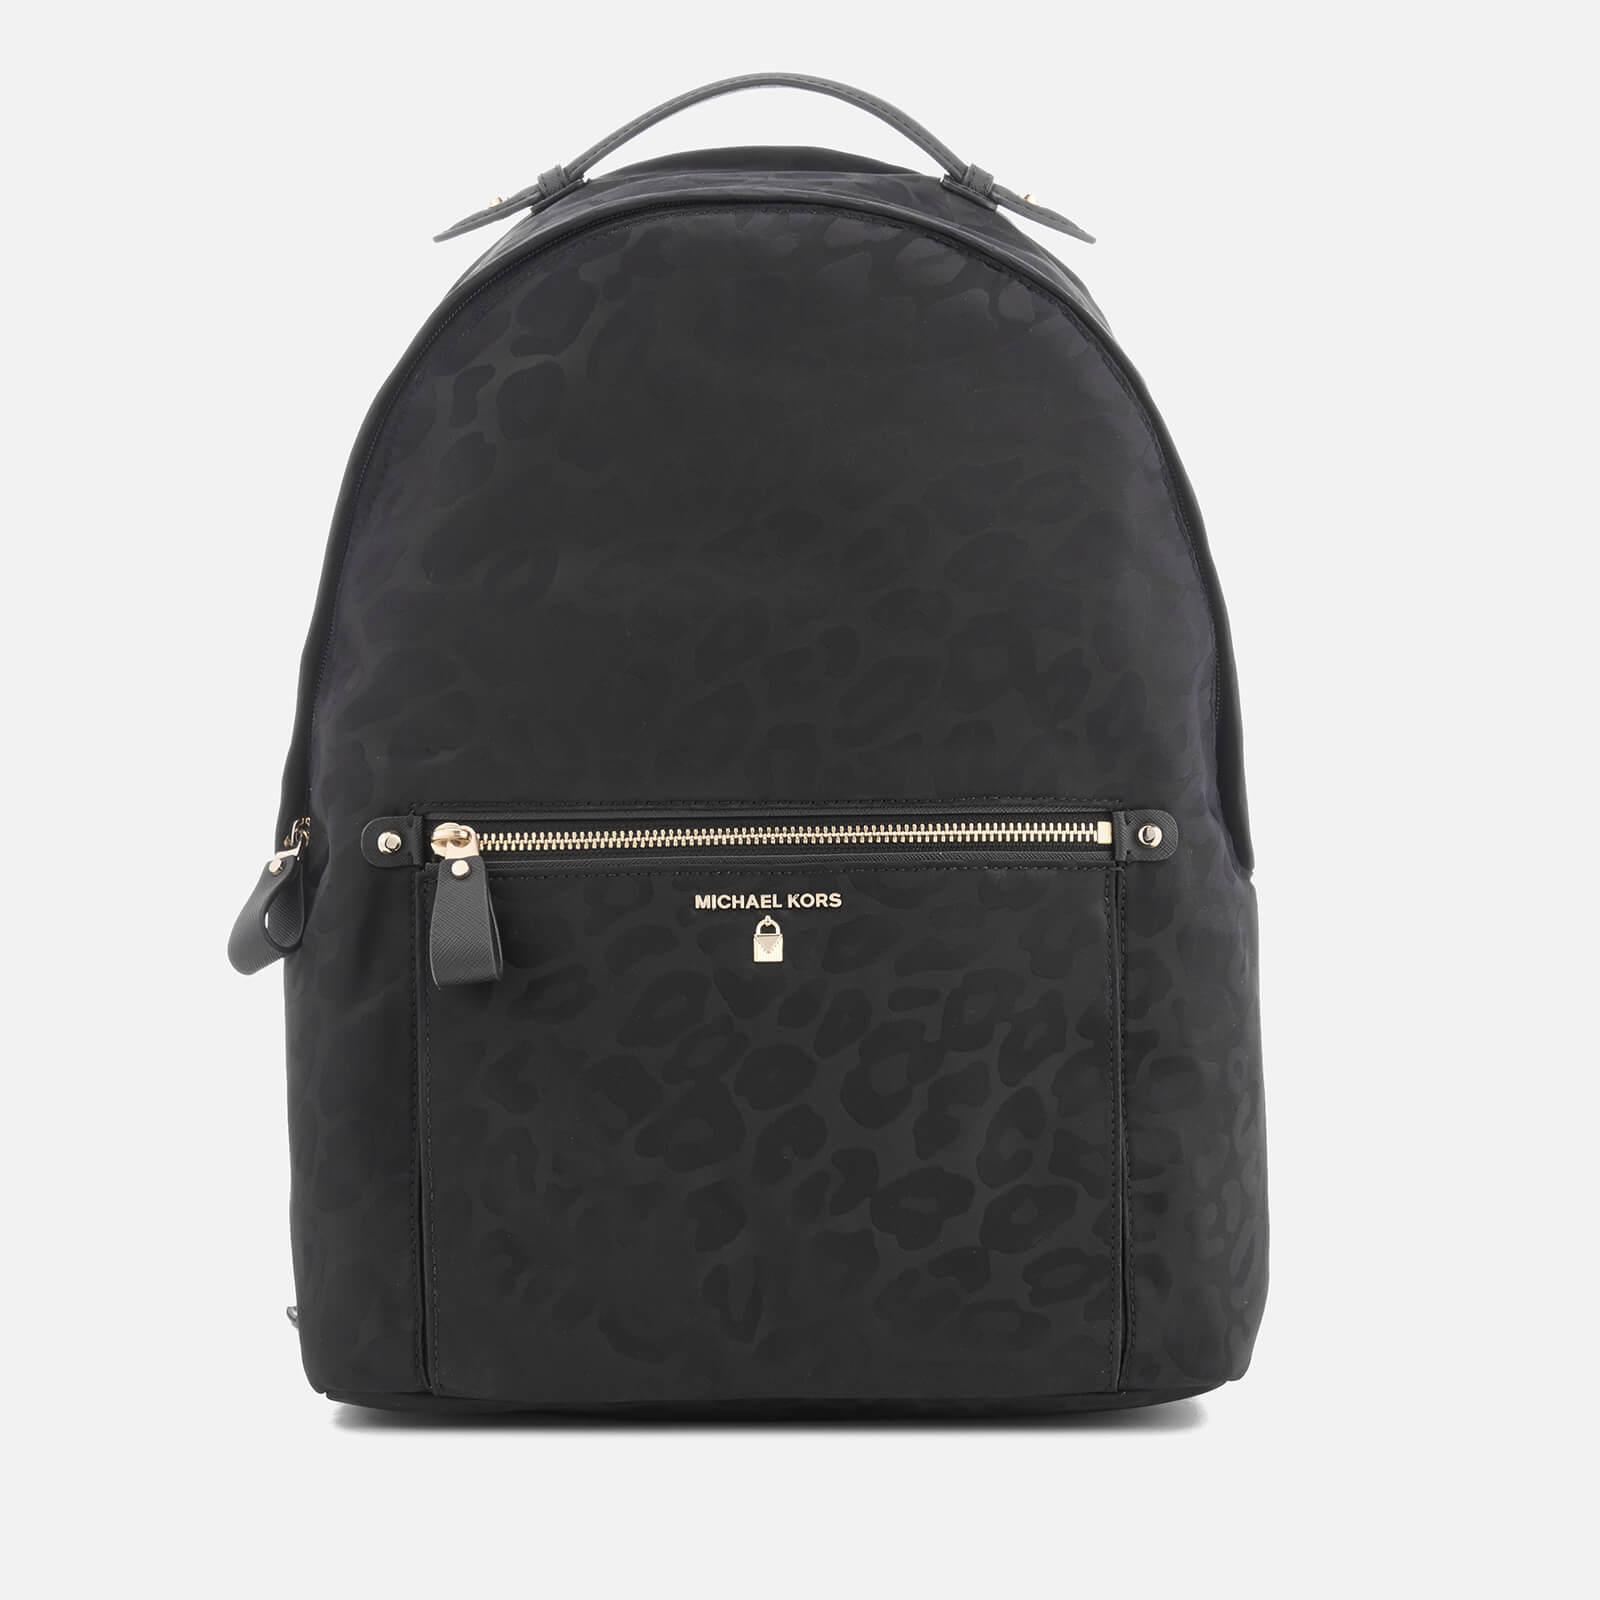 4c44c0ebfc5ec4 MICHAEL MICHAEL KORS Women's Kelsey Large Backpack - Black - Free UK  Delivery over £50